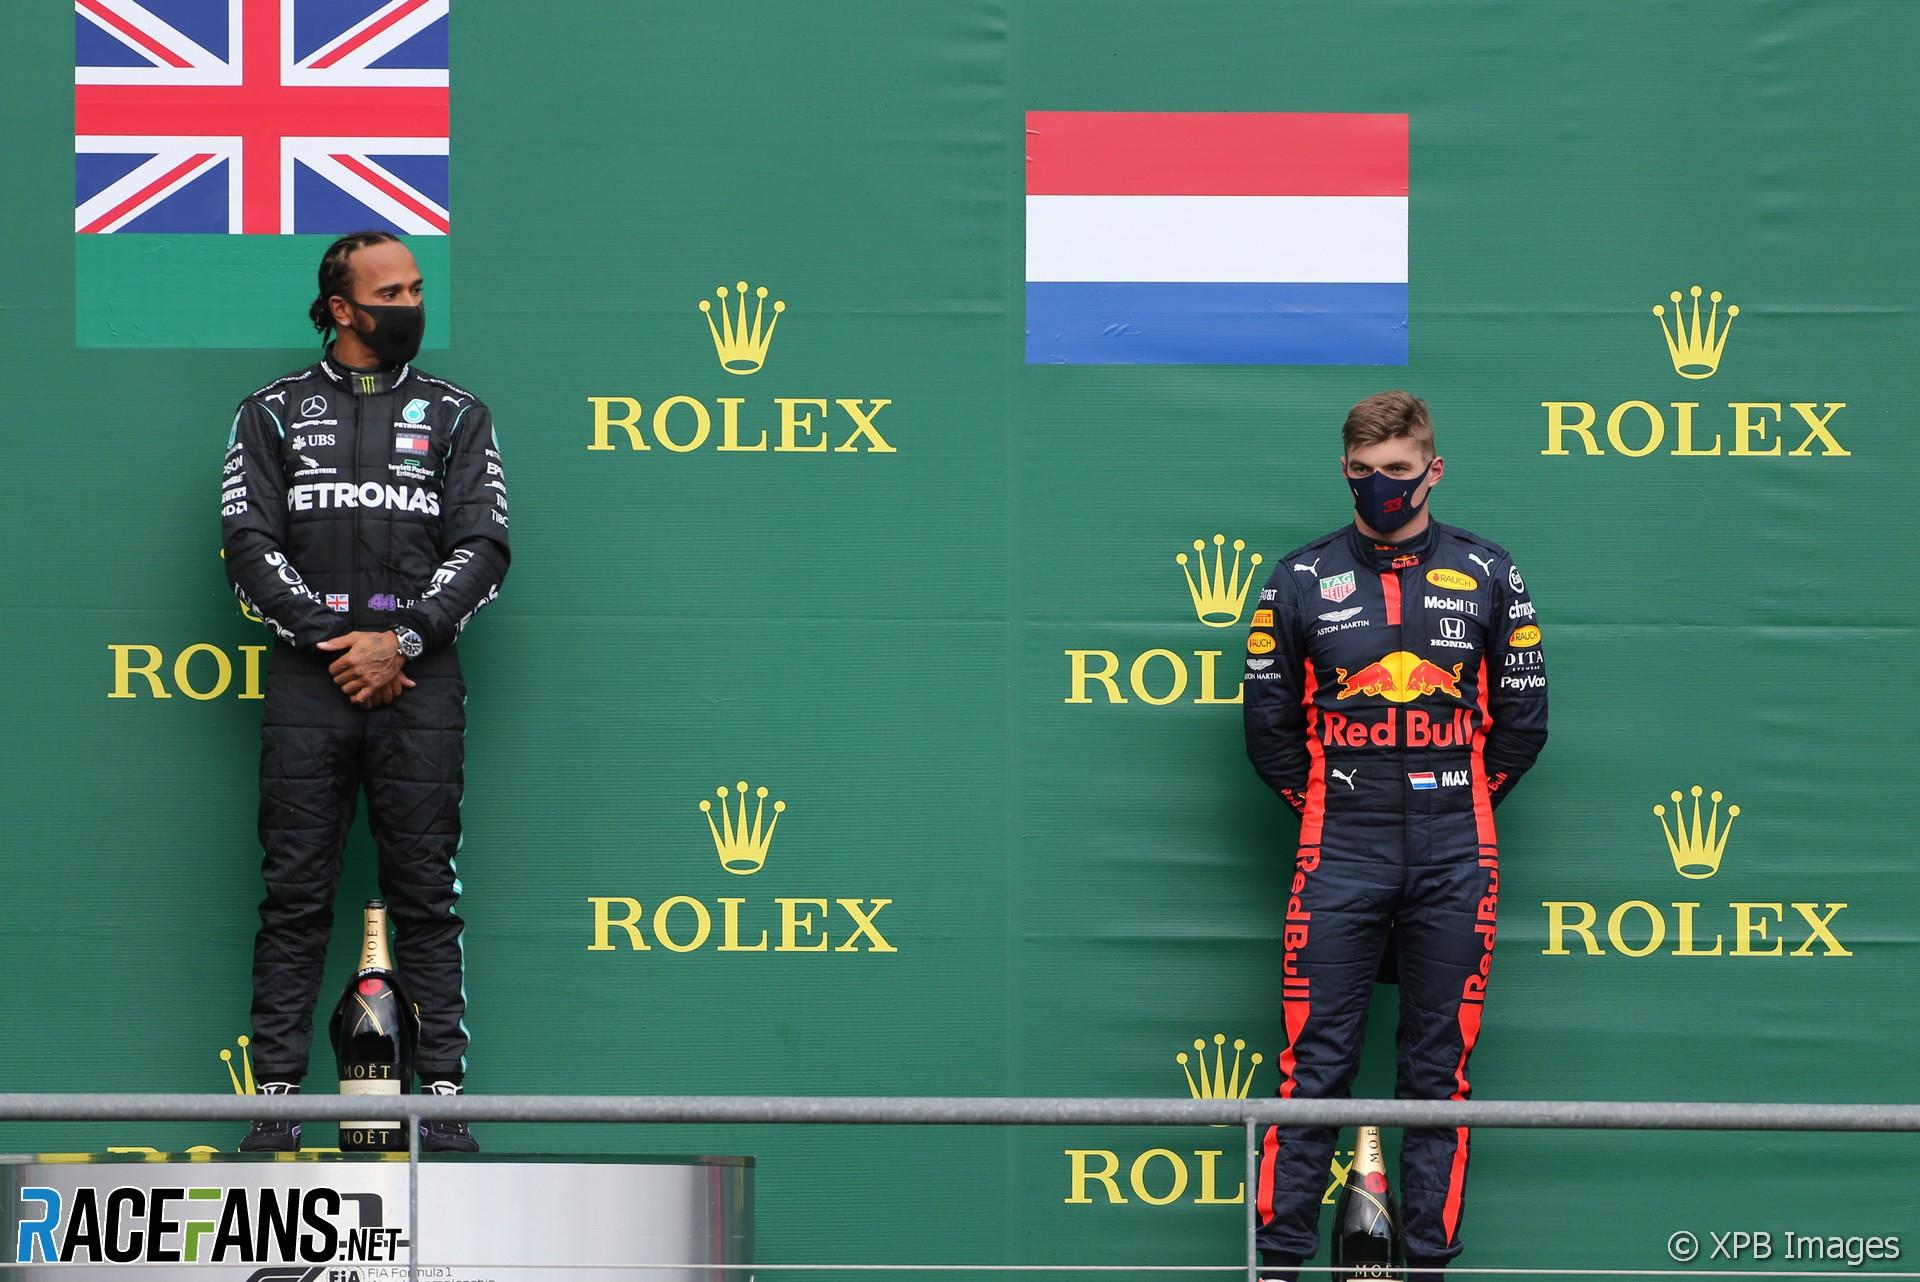 Lewis Hamilton, Max Verstappen, Spa-Francorchamps, 2020